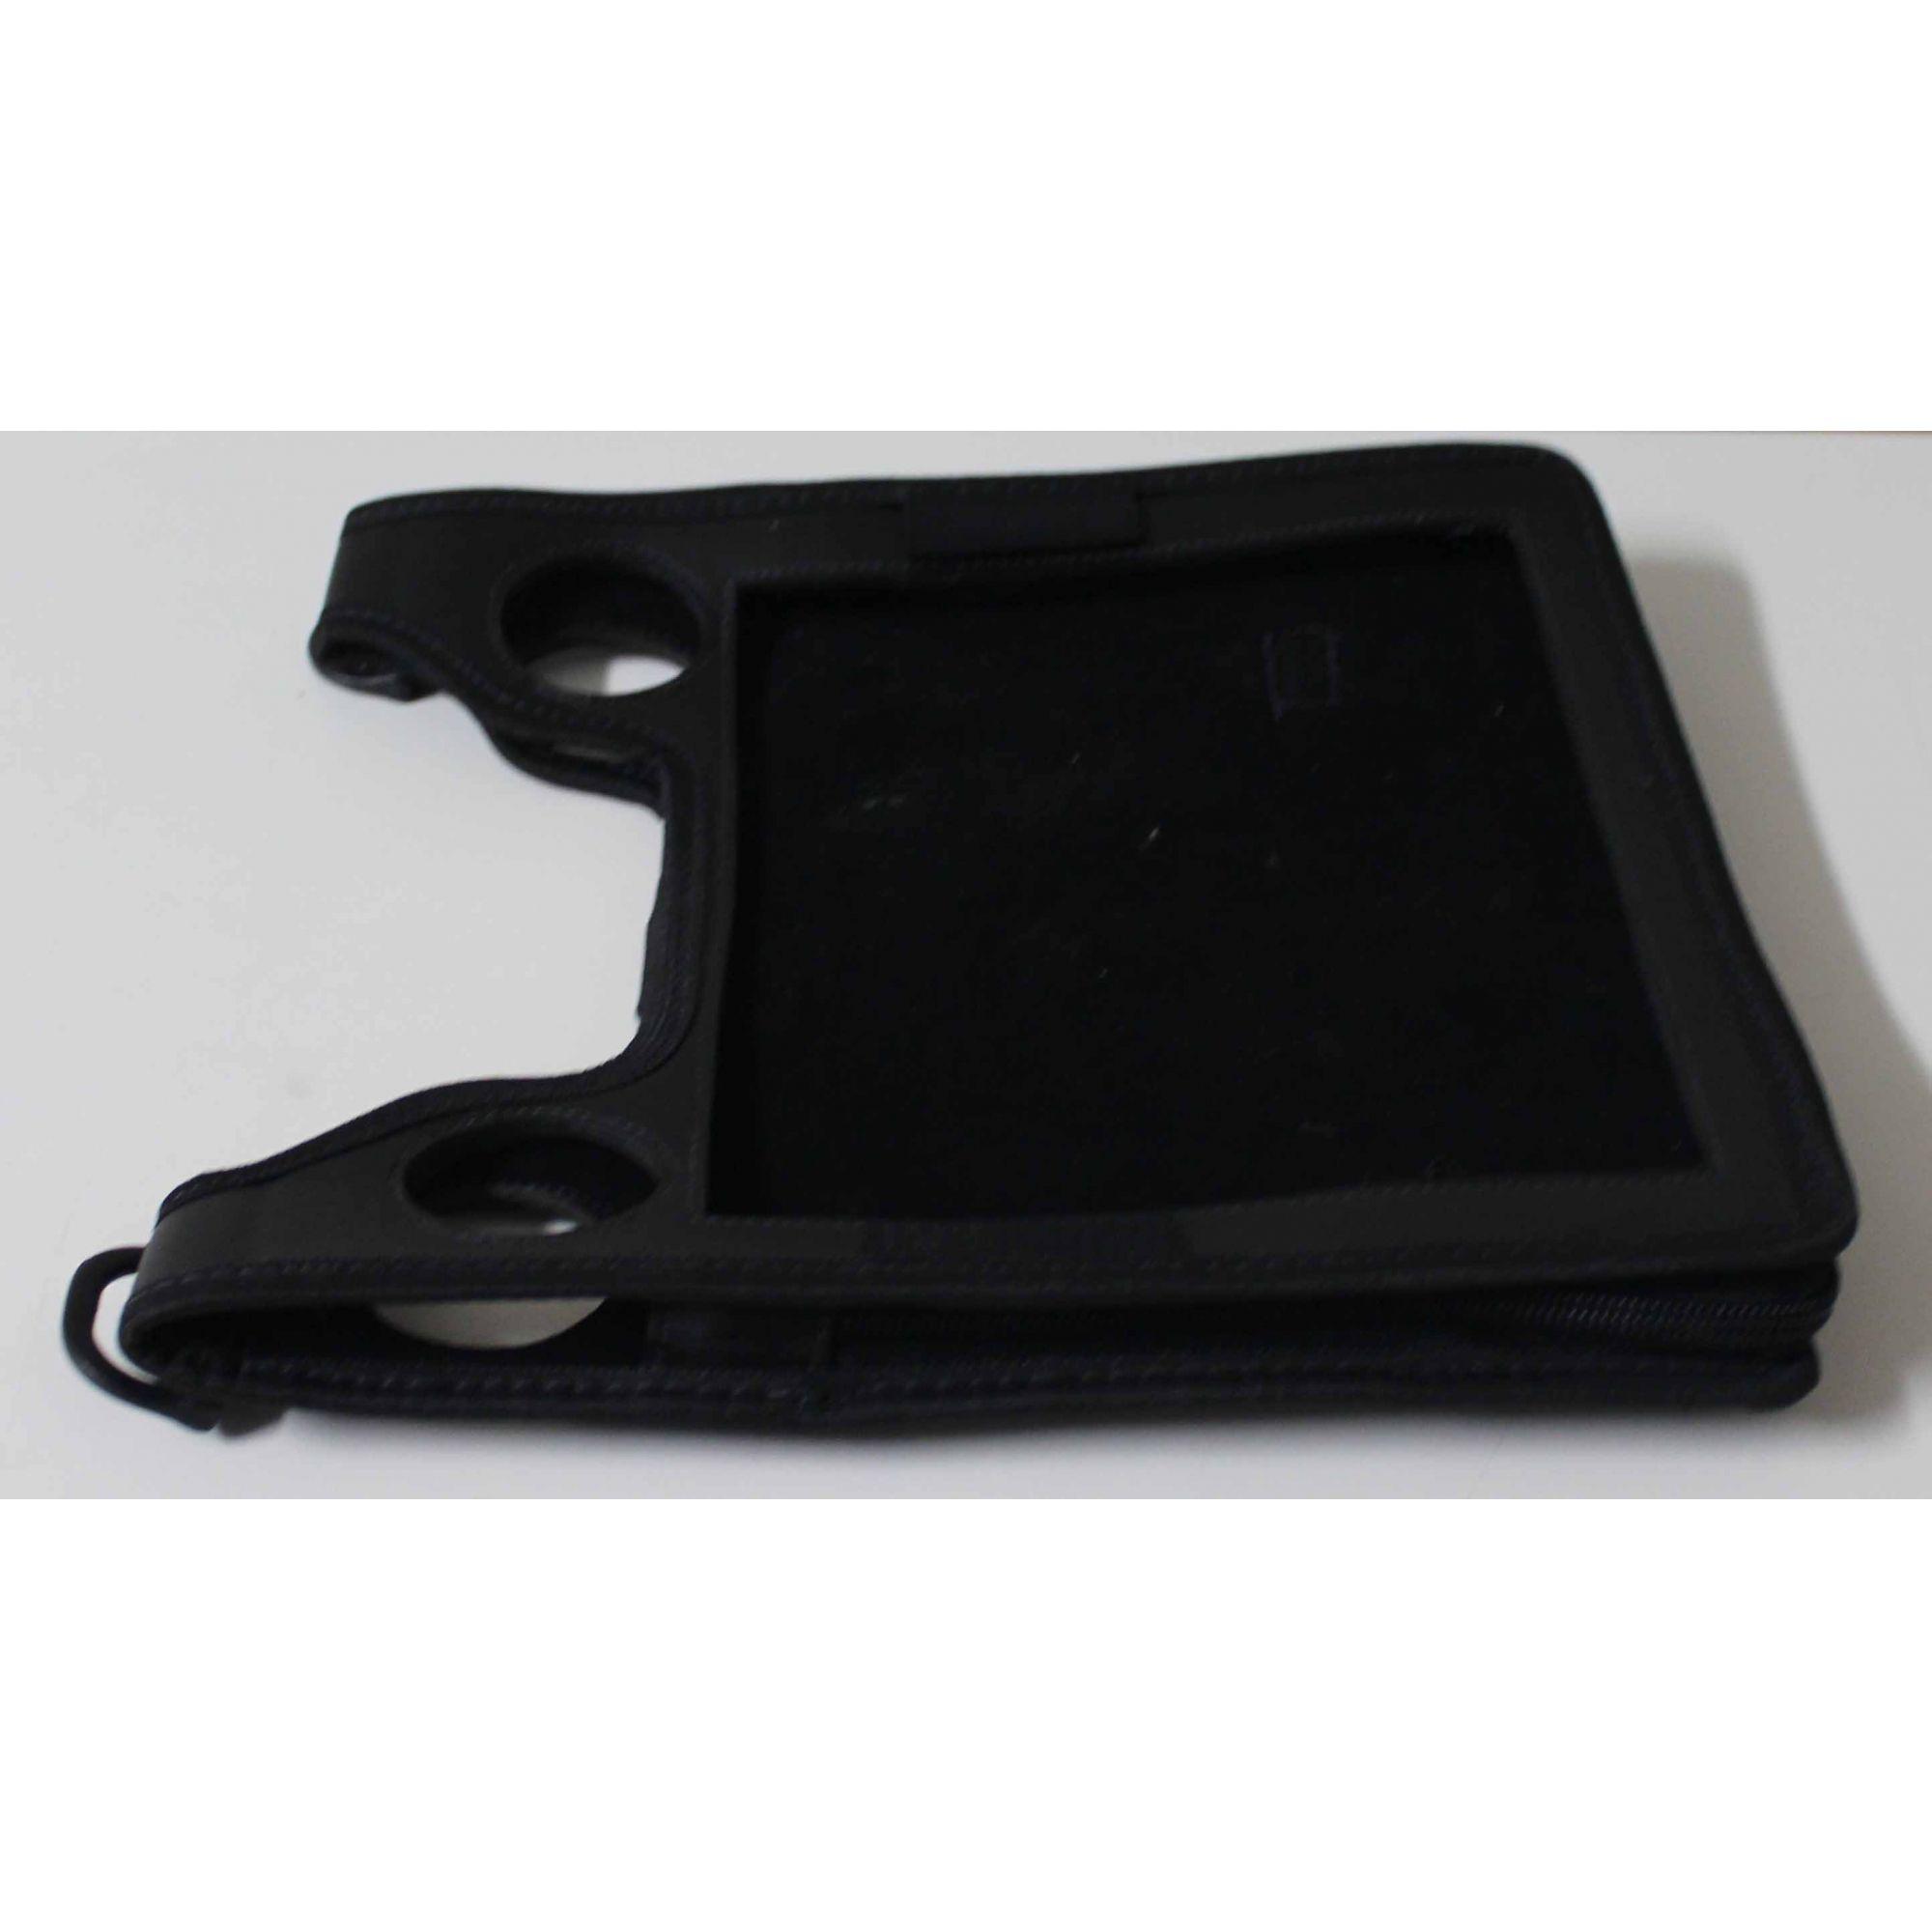 Capa Para Tablet Motion + Alça